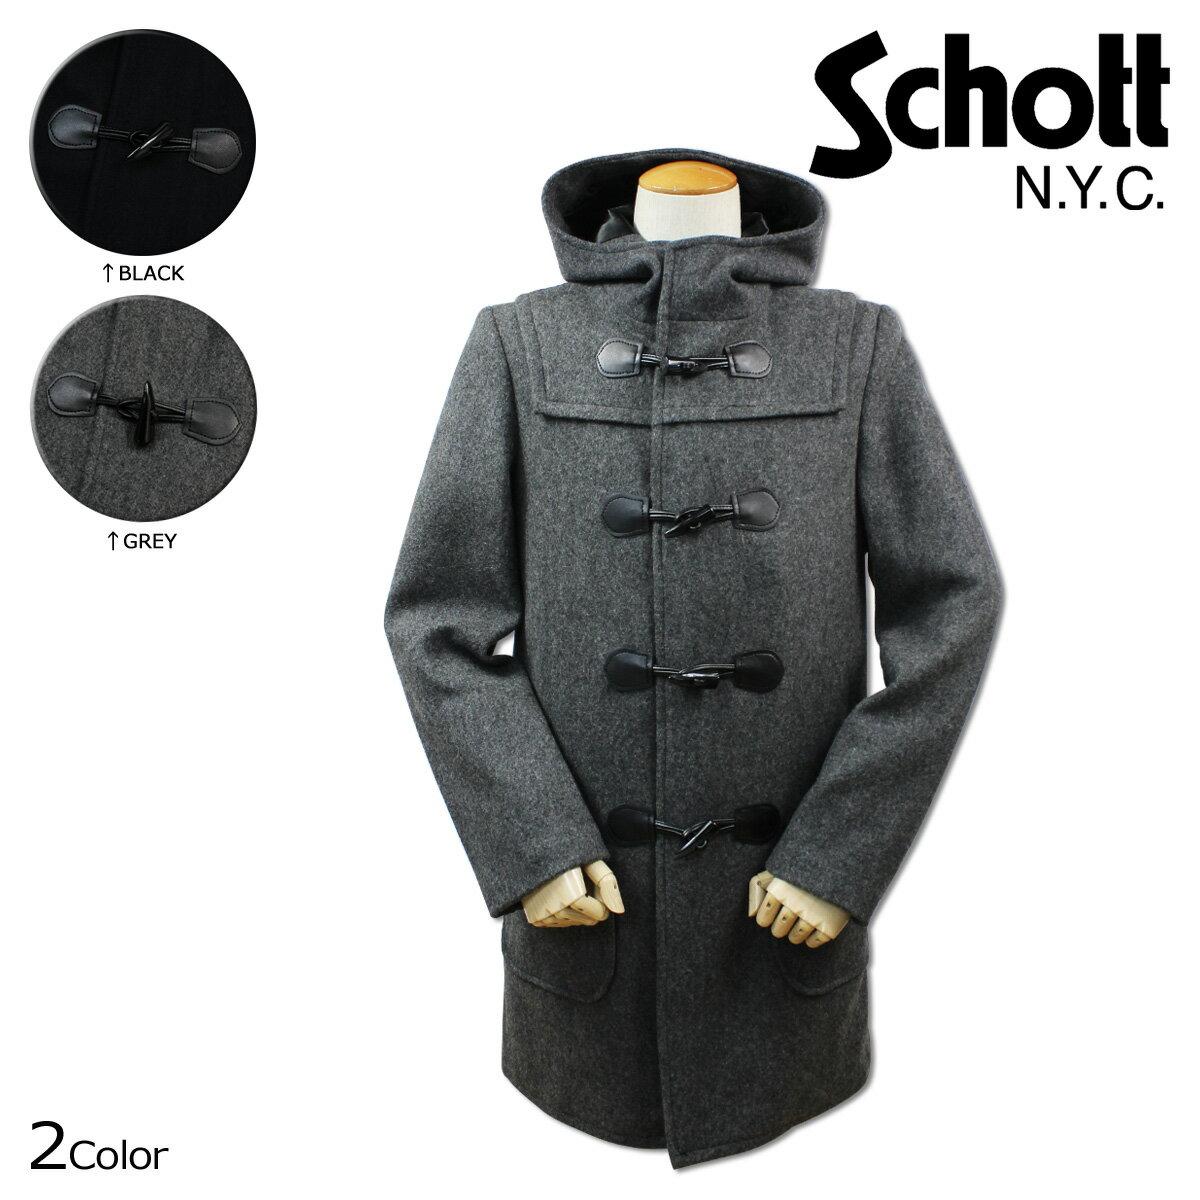 Schott ショット ダッフルコート 2カラー DUFFLE COAT メンズ [S30][返品不可]